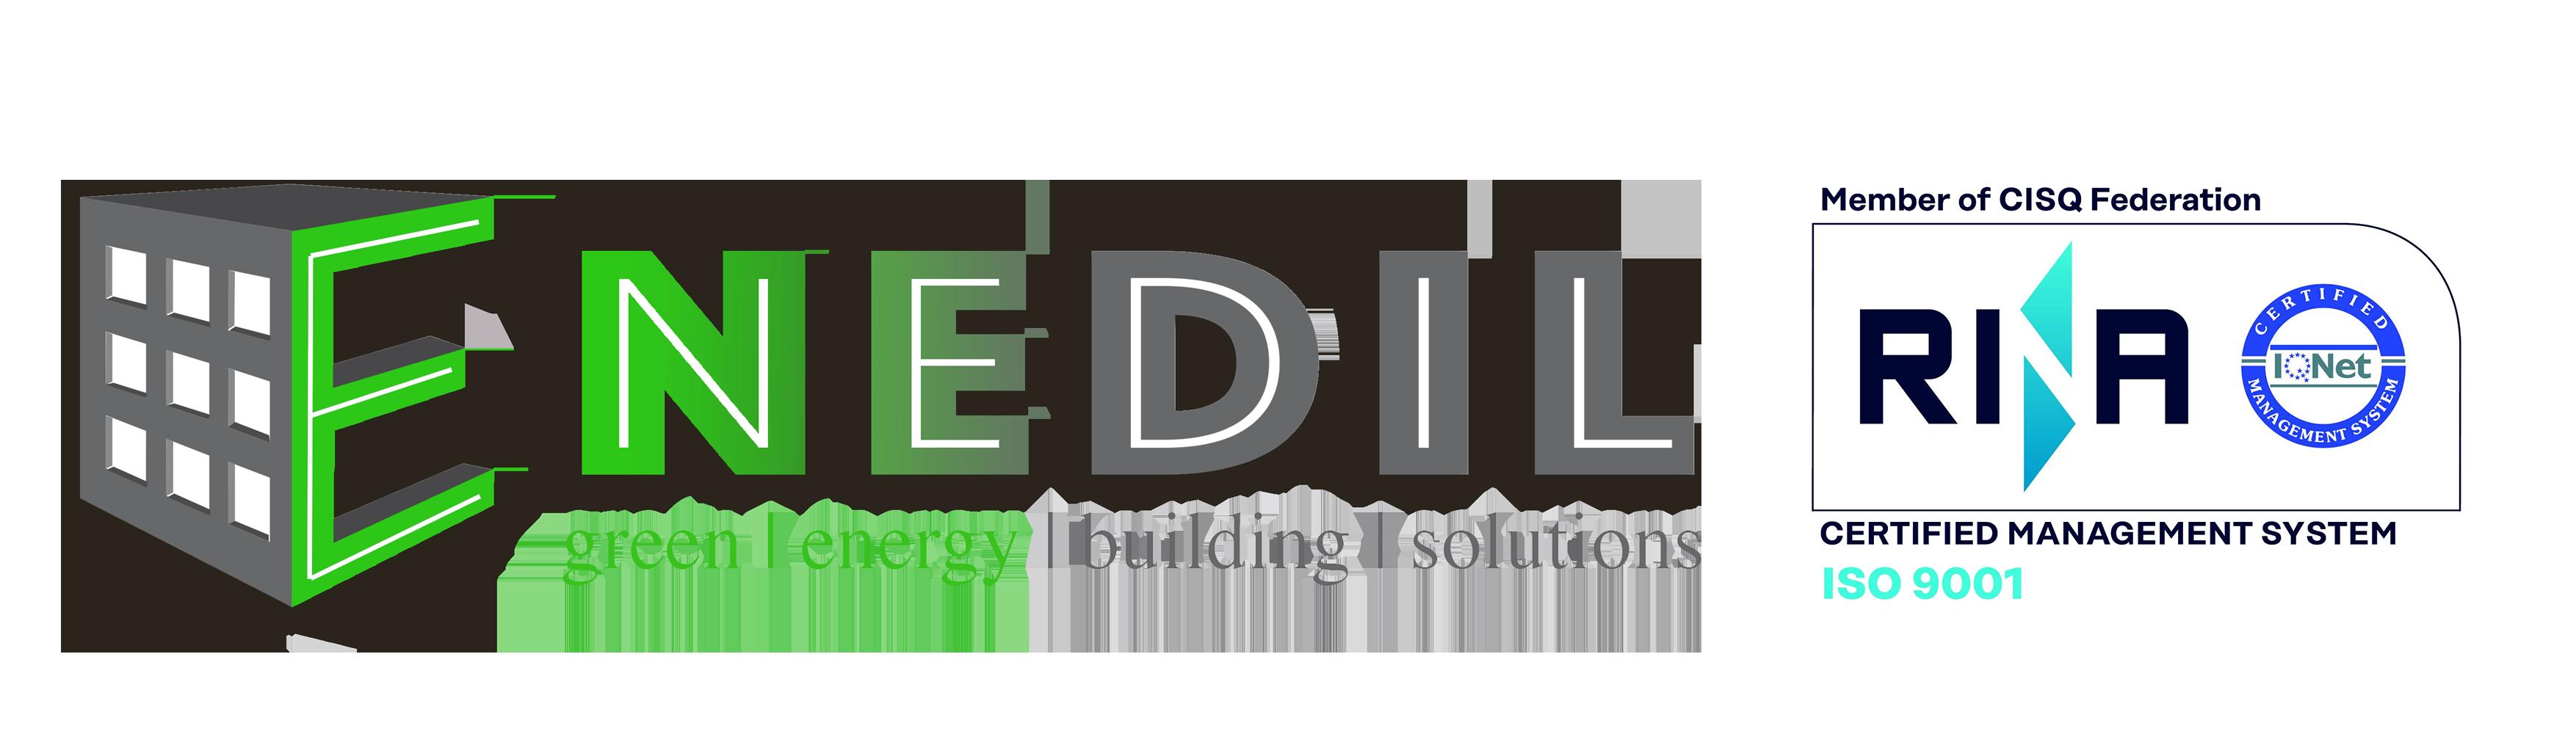 logo_enedil_colore